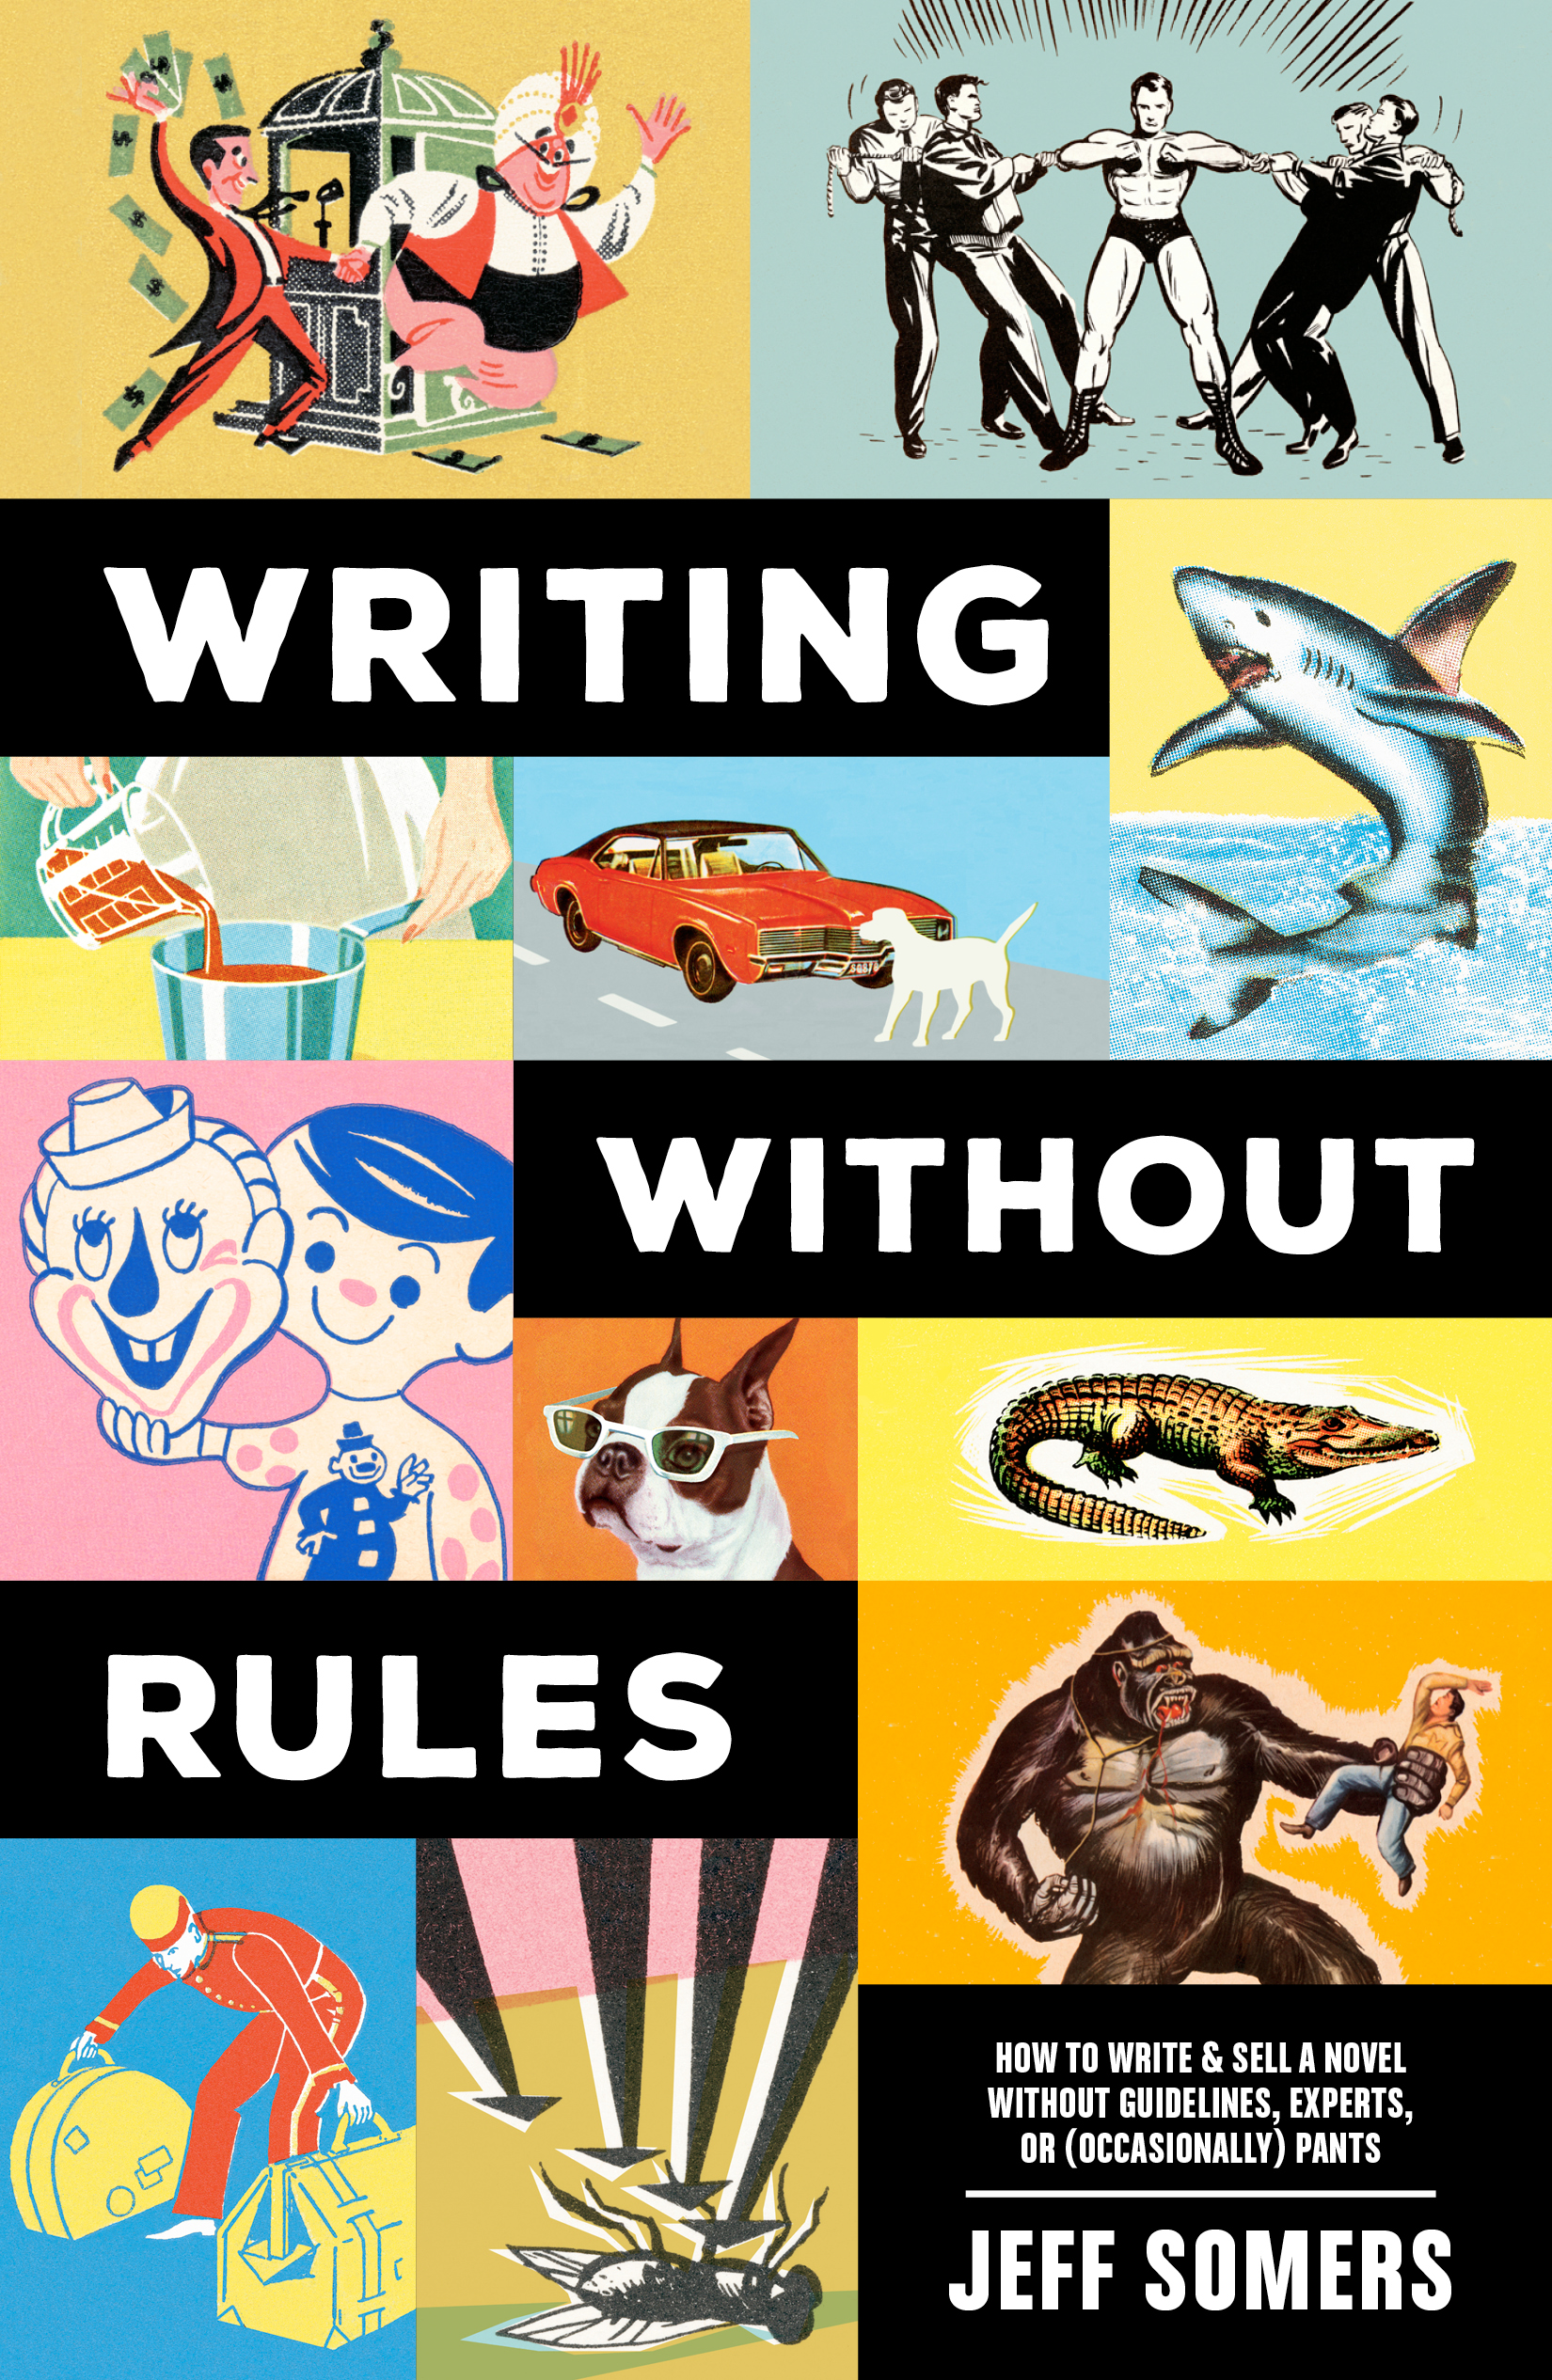 WritingWithoutRules_C.jpg